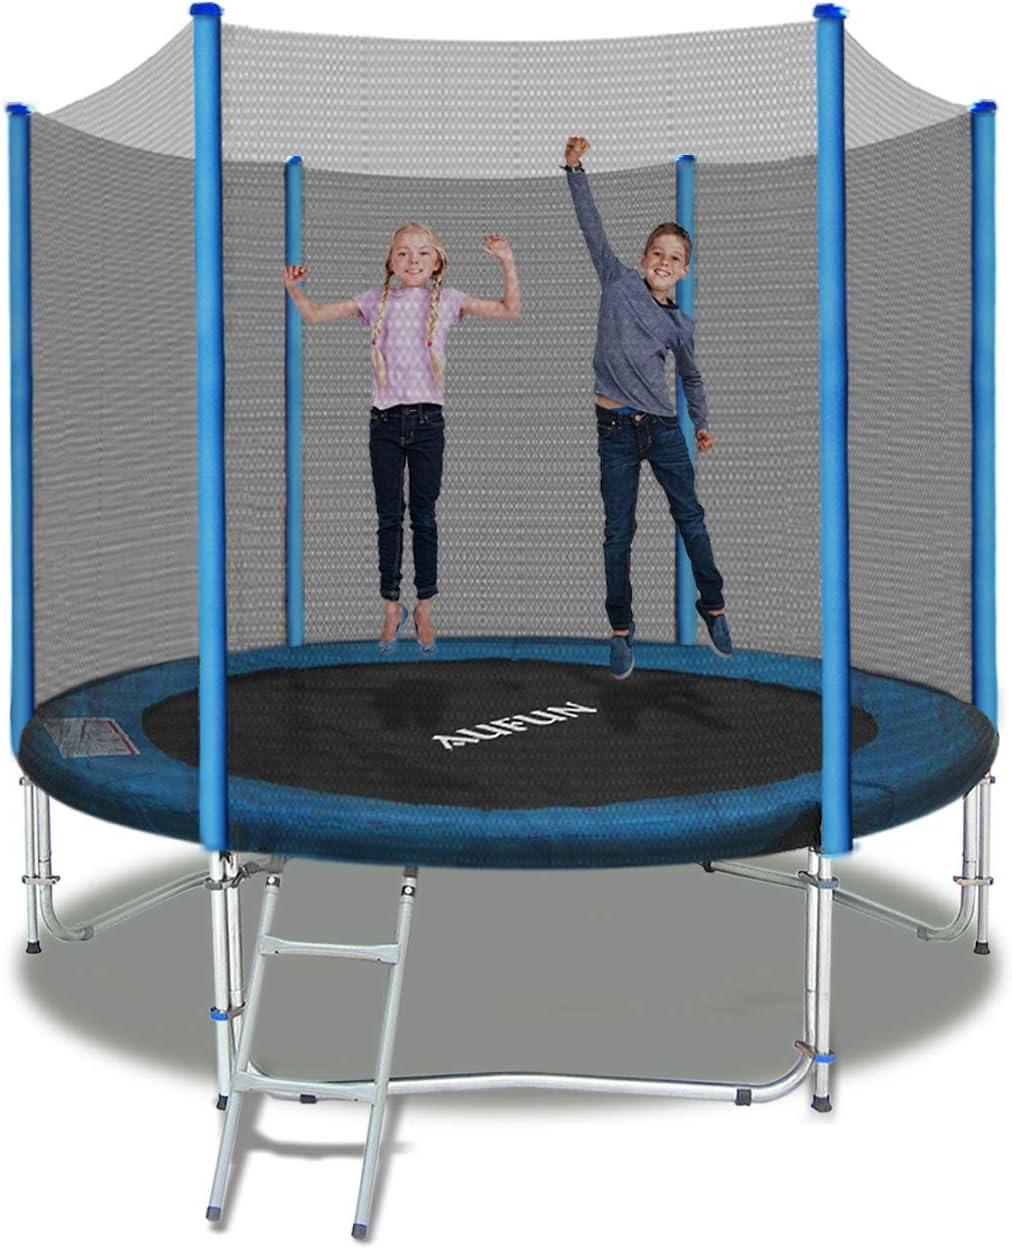 tappi inclusi 92 cm UISEBRT per 8 aste 16 tubi in gommapiuma per trampolino elastico